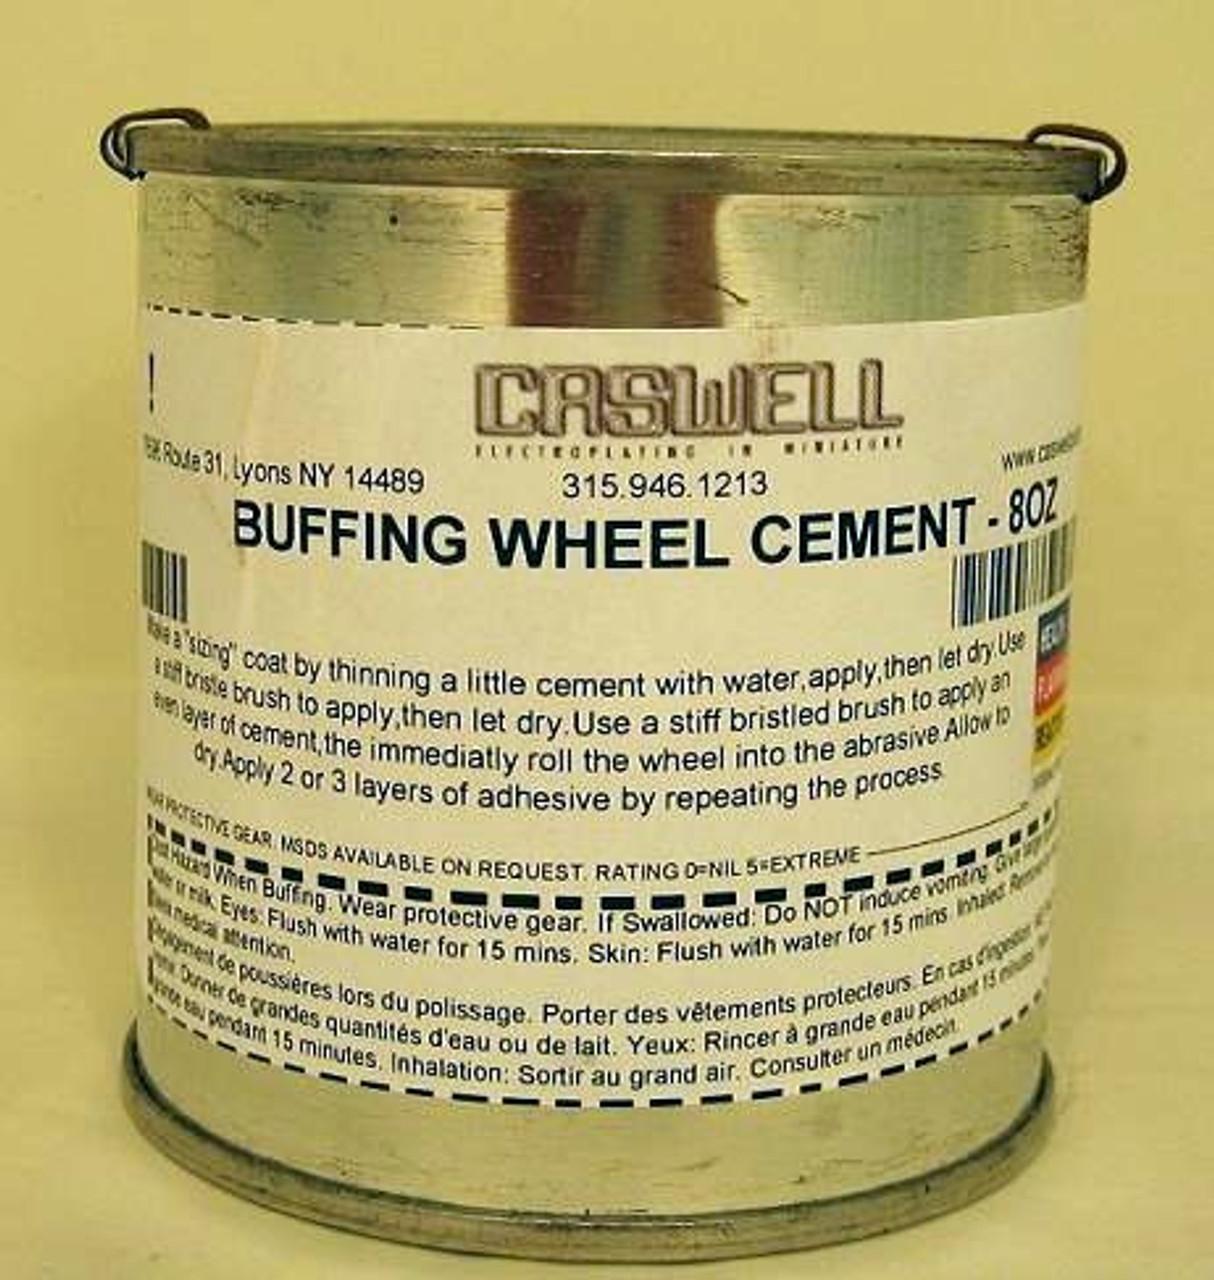 BUFFING WHEEL CEMENT - 8OZ